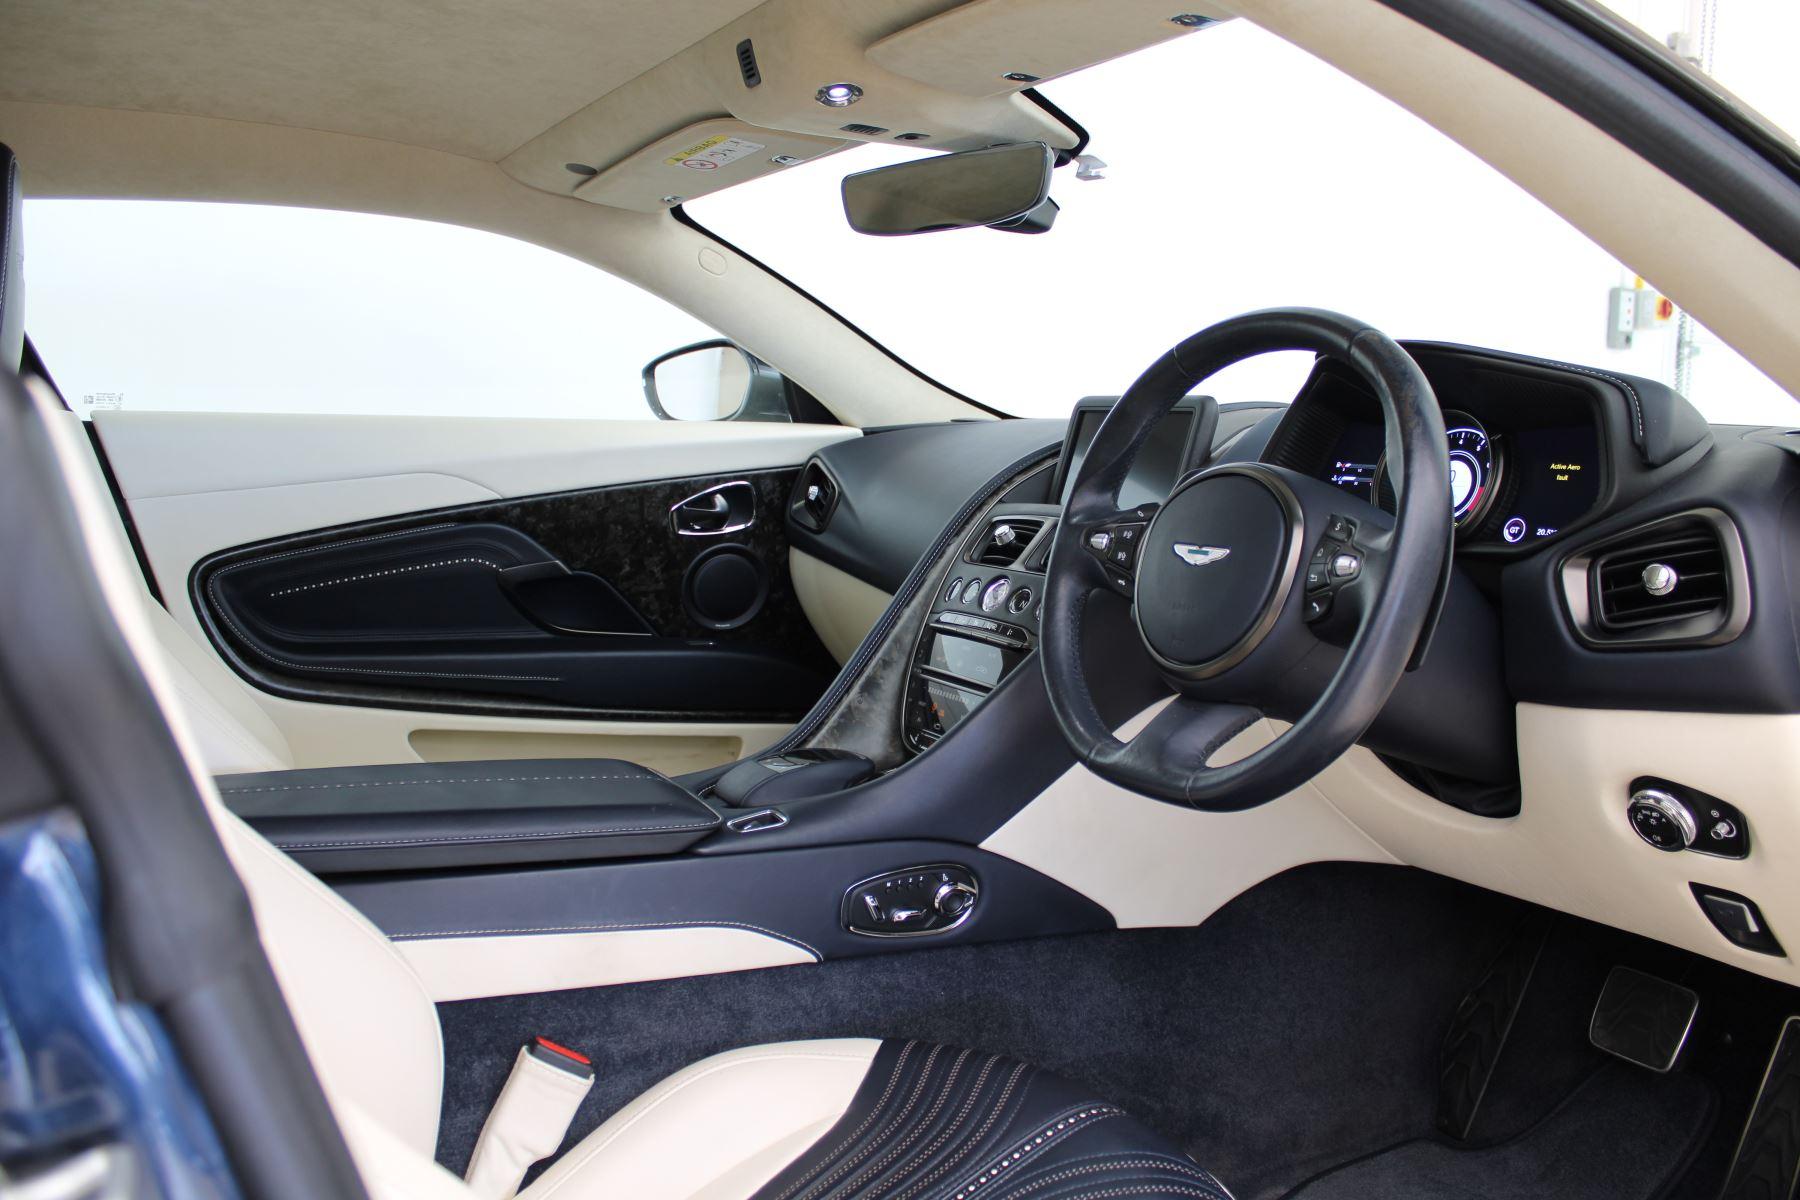 Aston Martin DB11 V12 2dr Touchtronic image 6